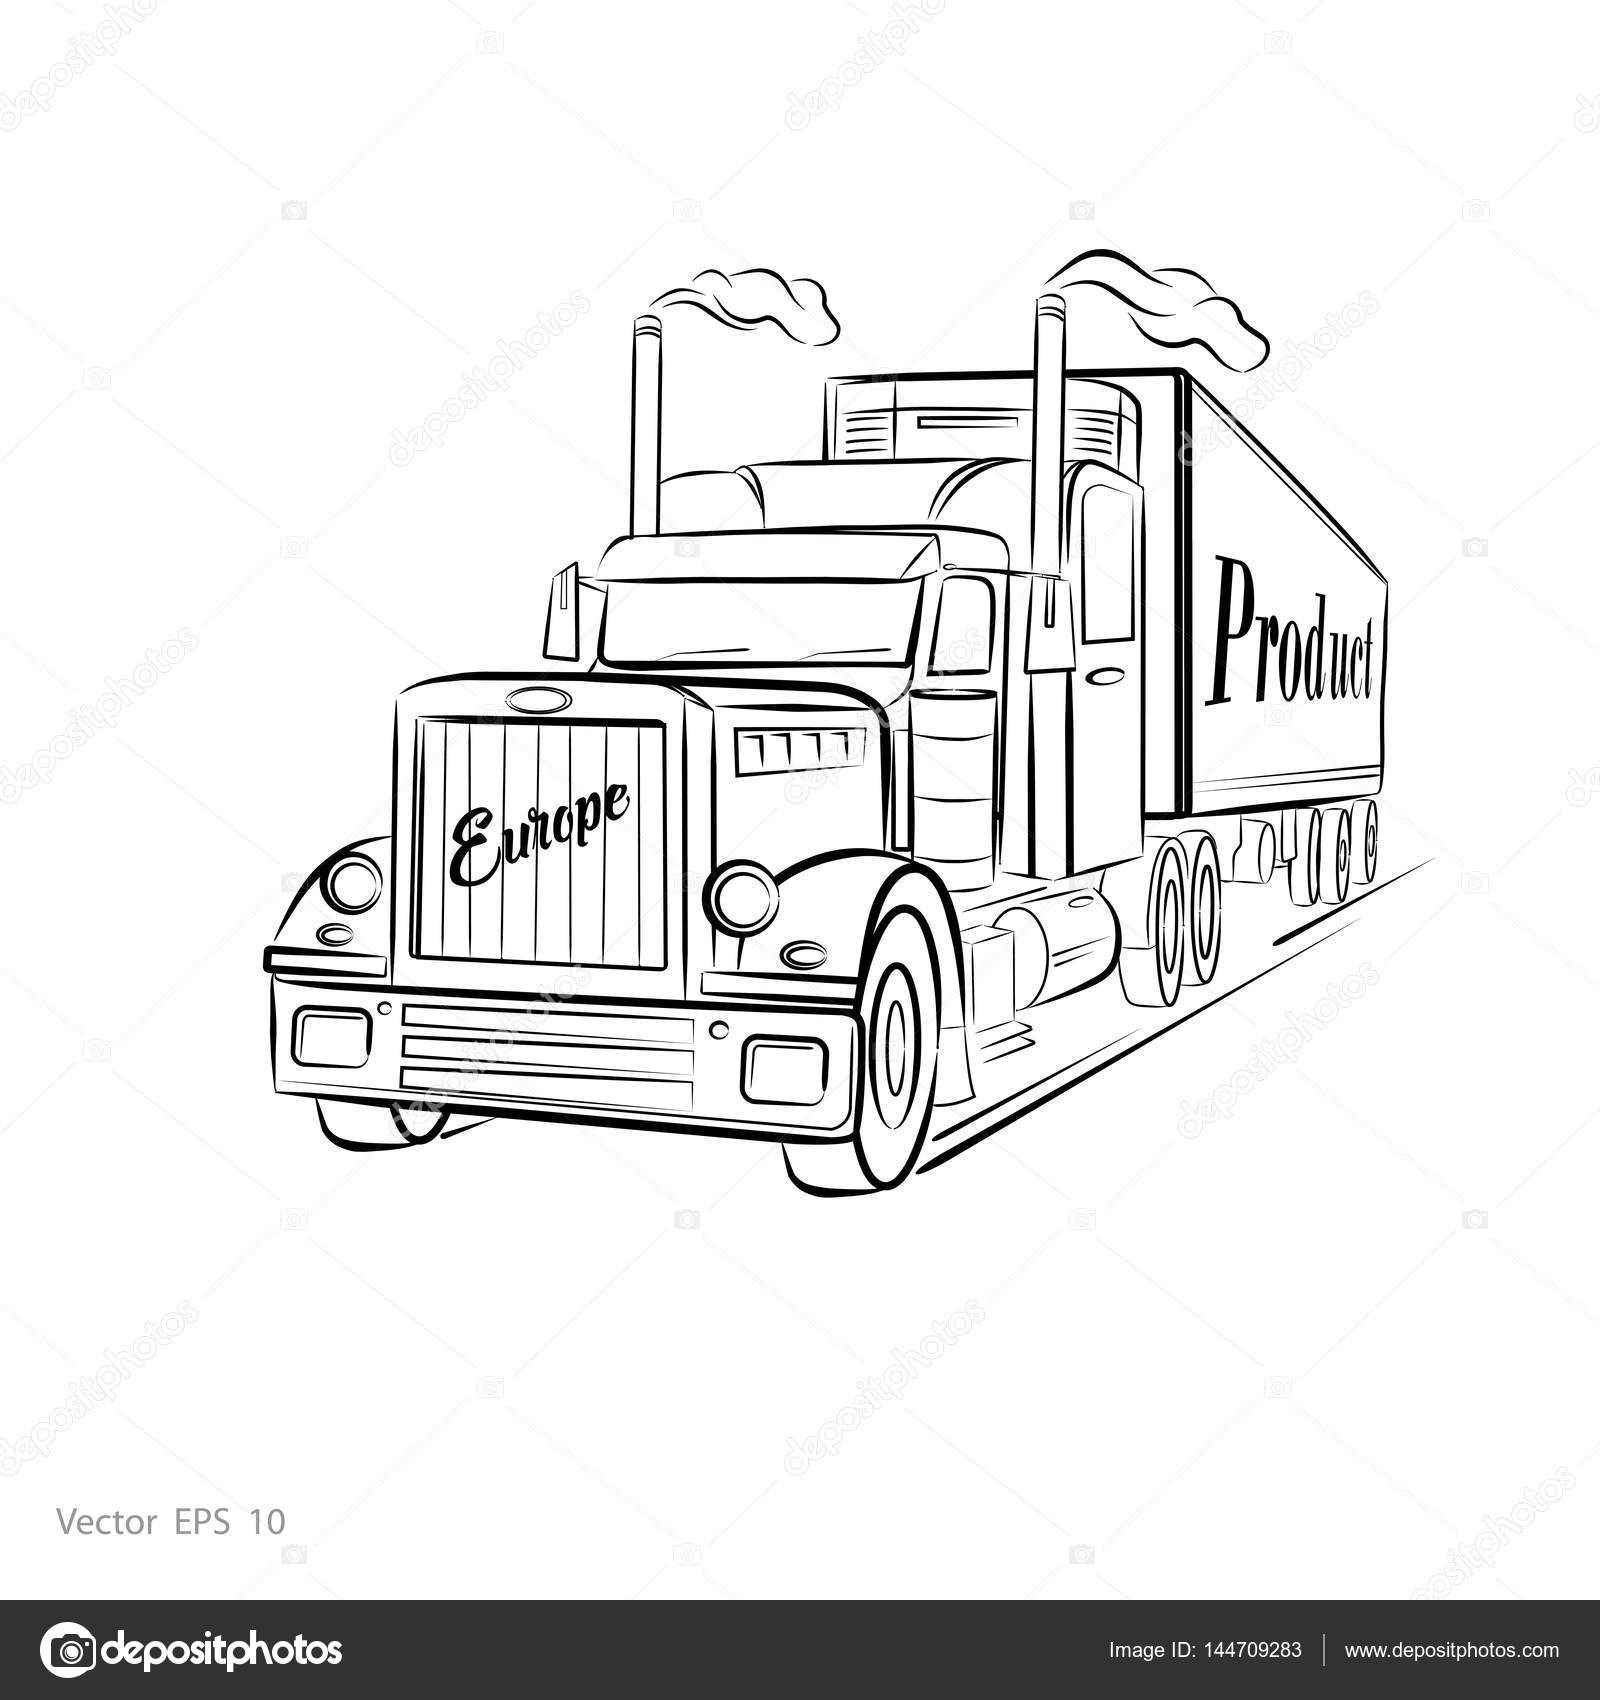 Drawings Truck Drawing Truck Vector Stock Vector C Aleks49011 144709283